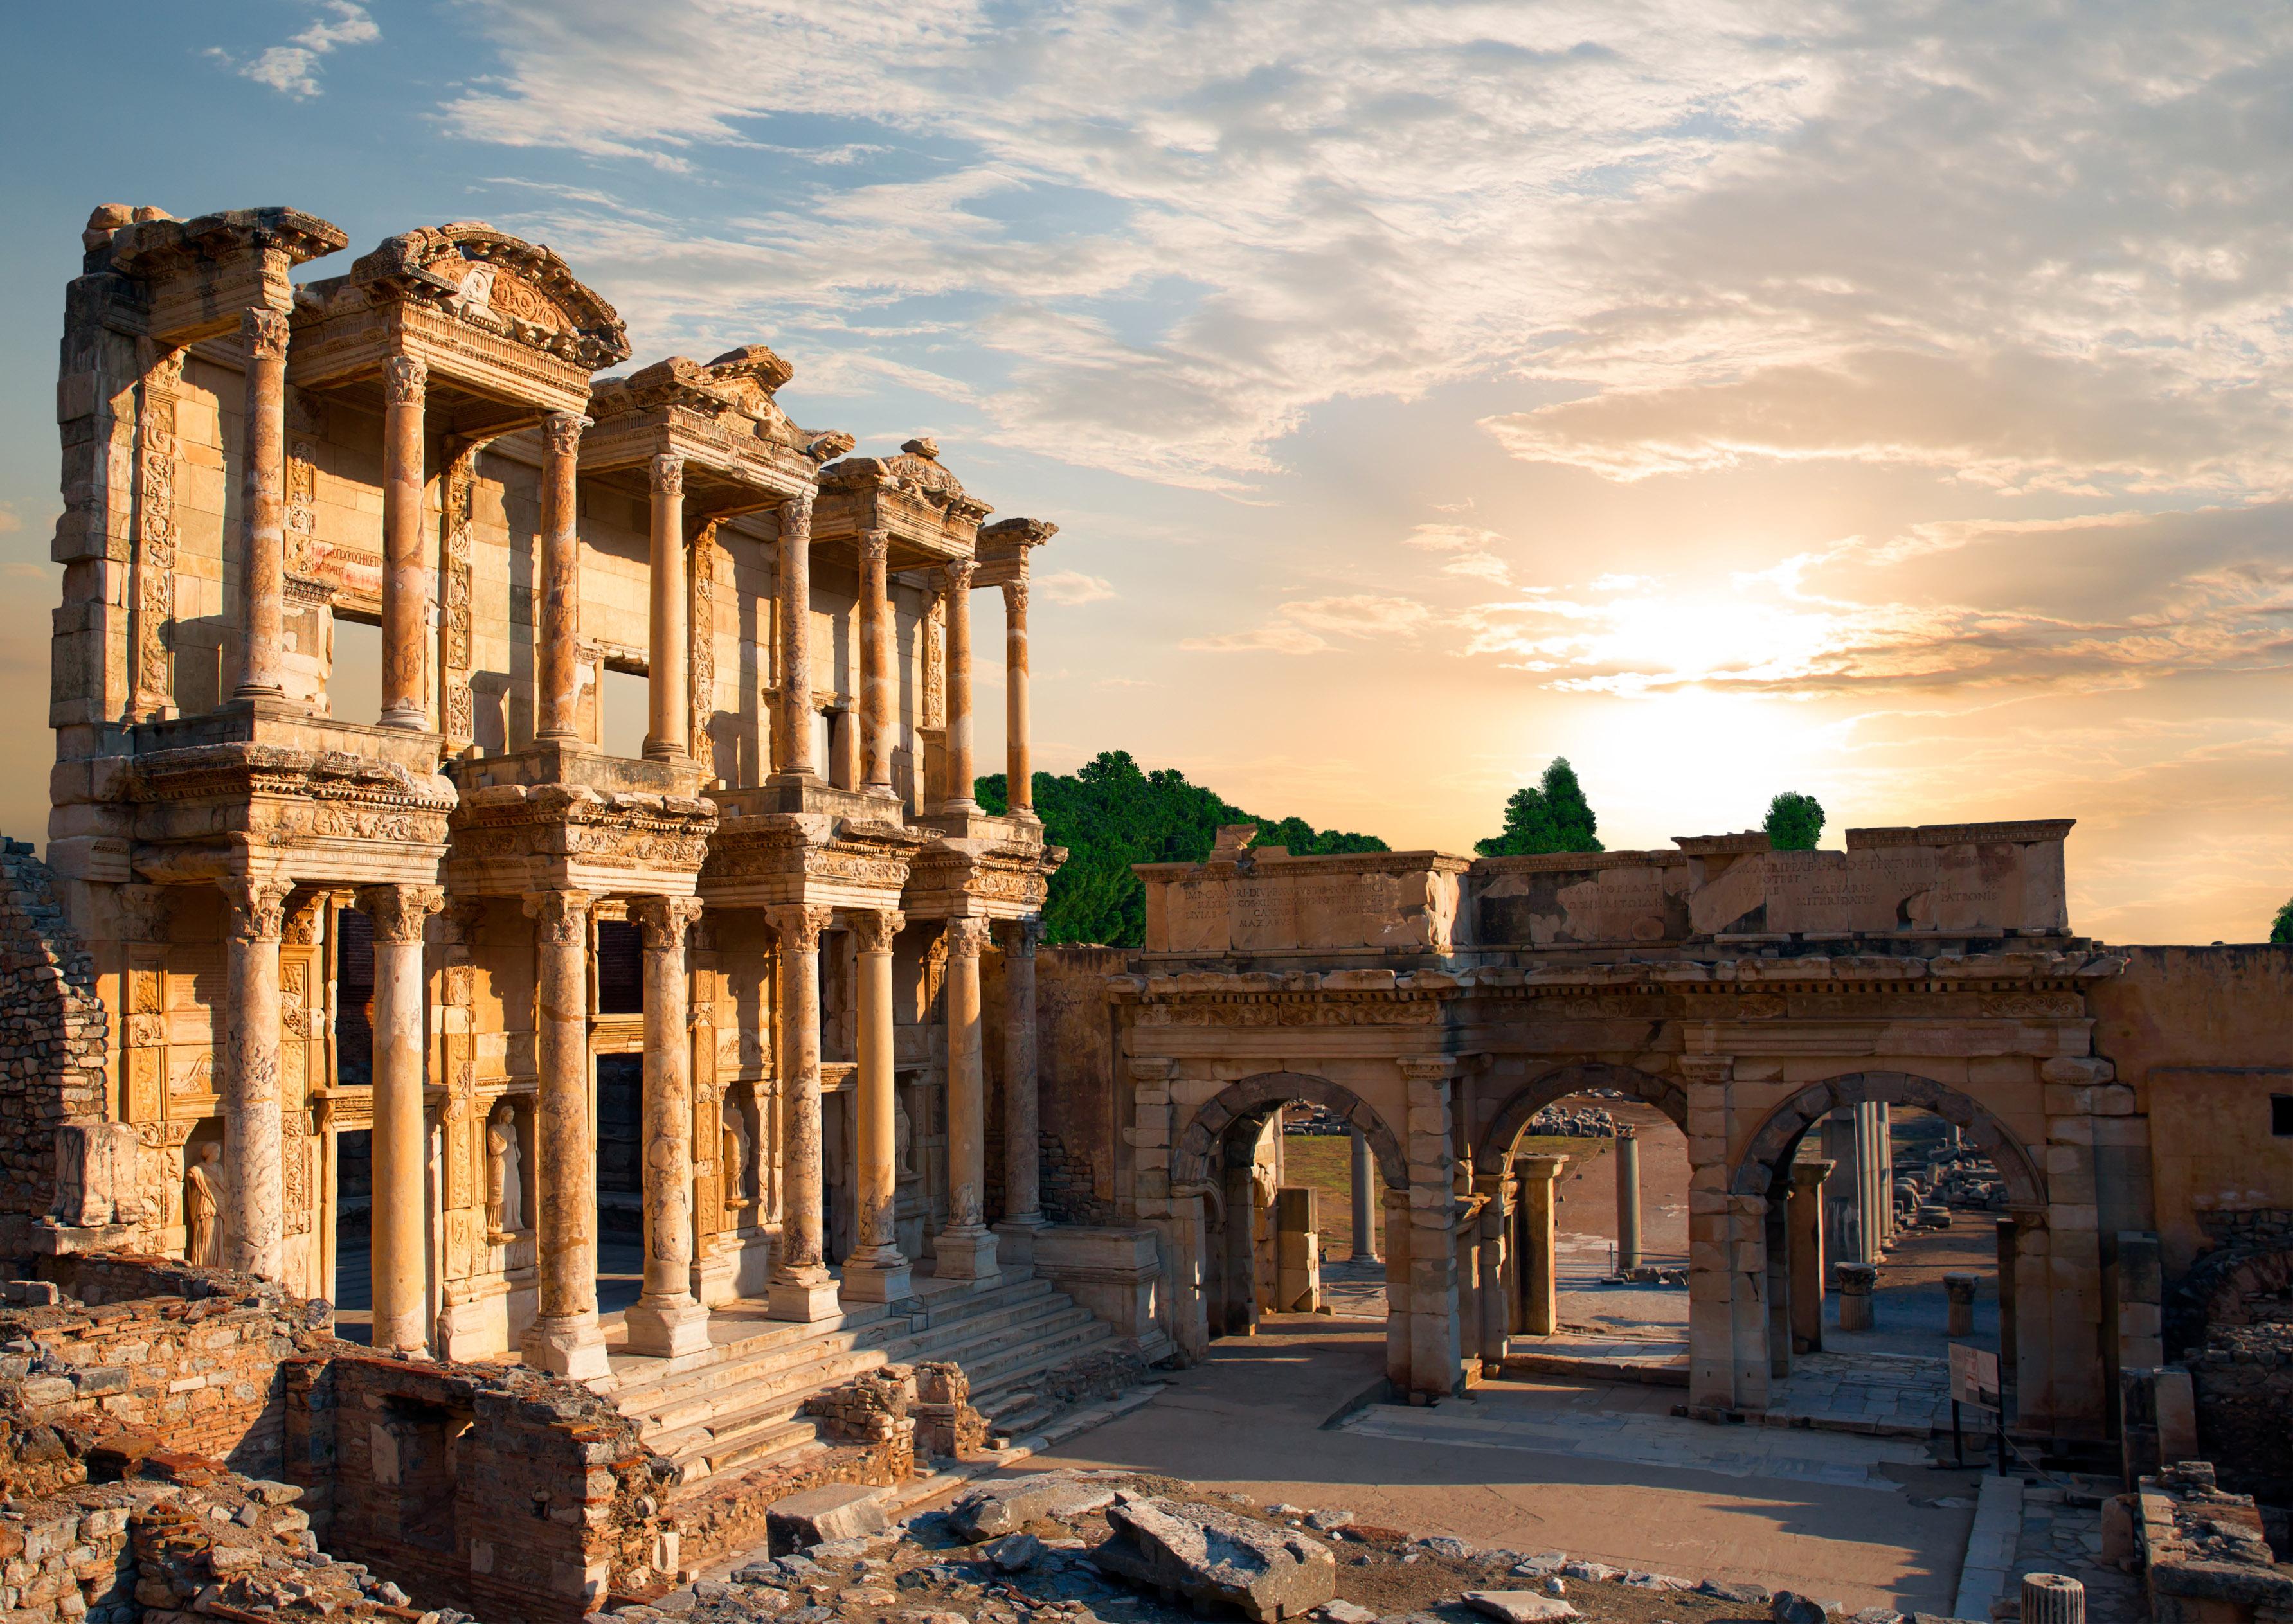 Die Celsus Bibliothek in den Ruinen von Epheseus.